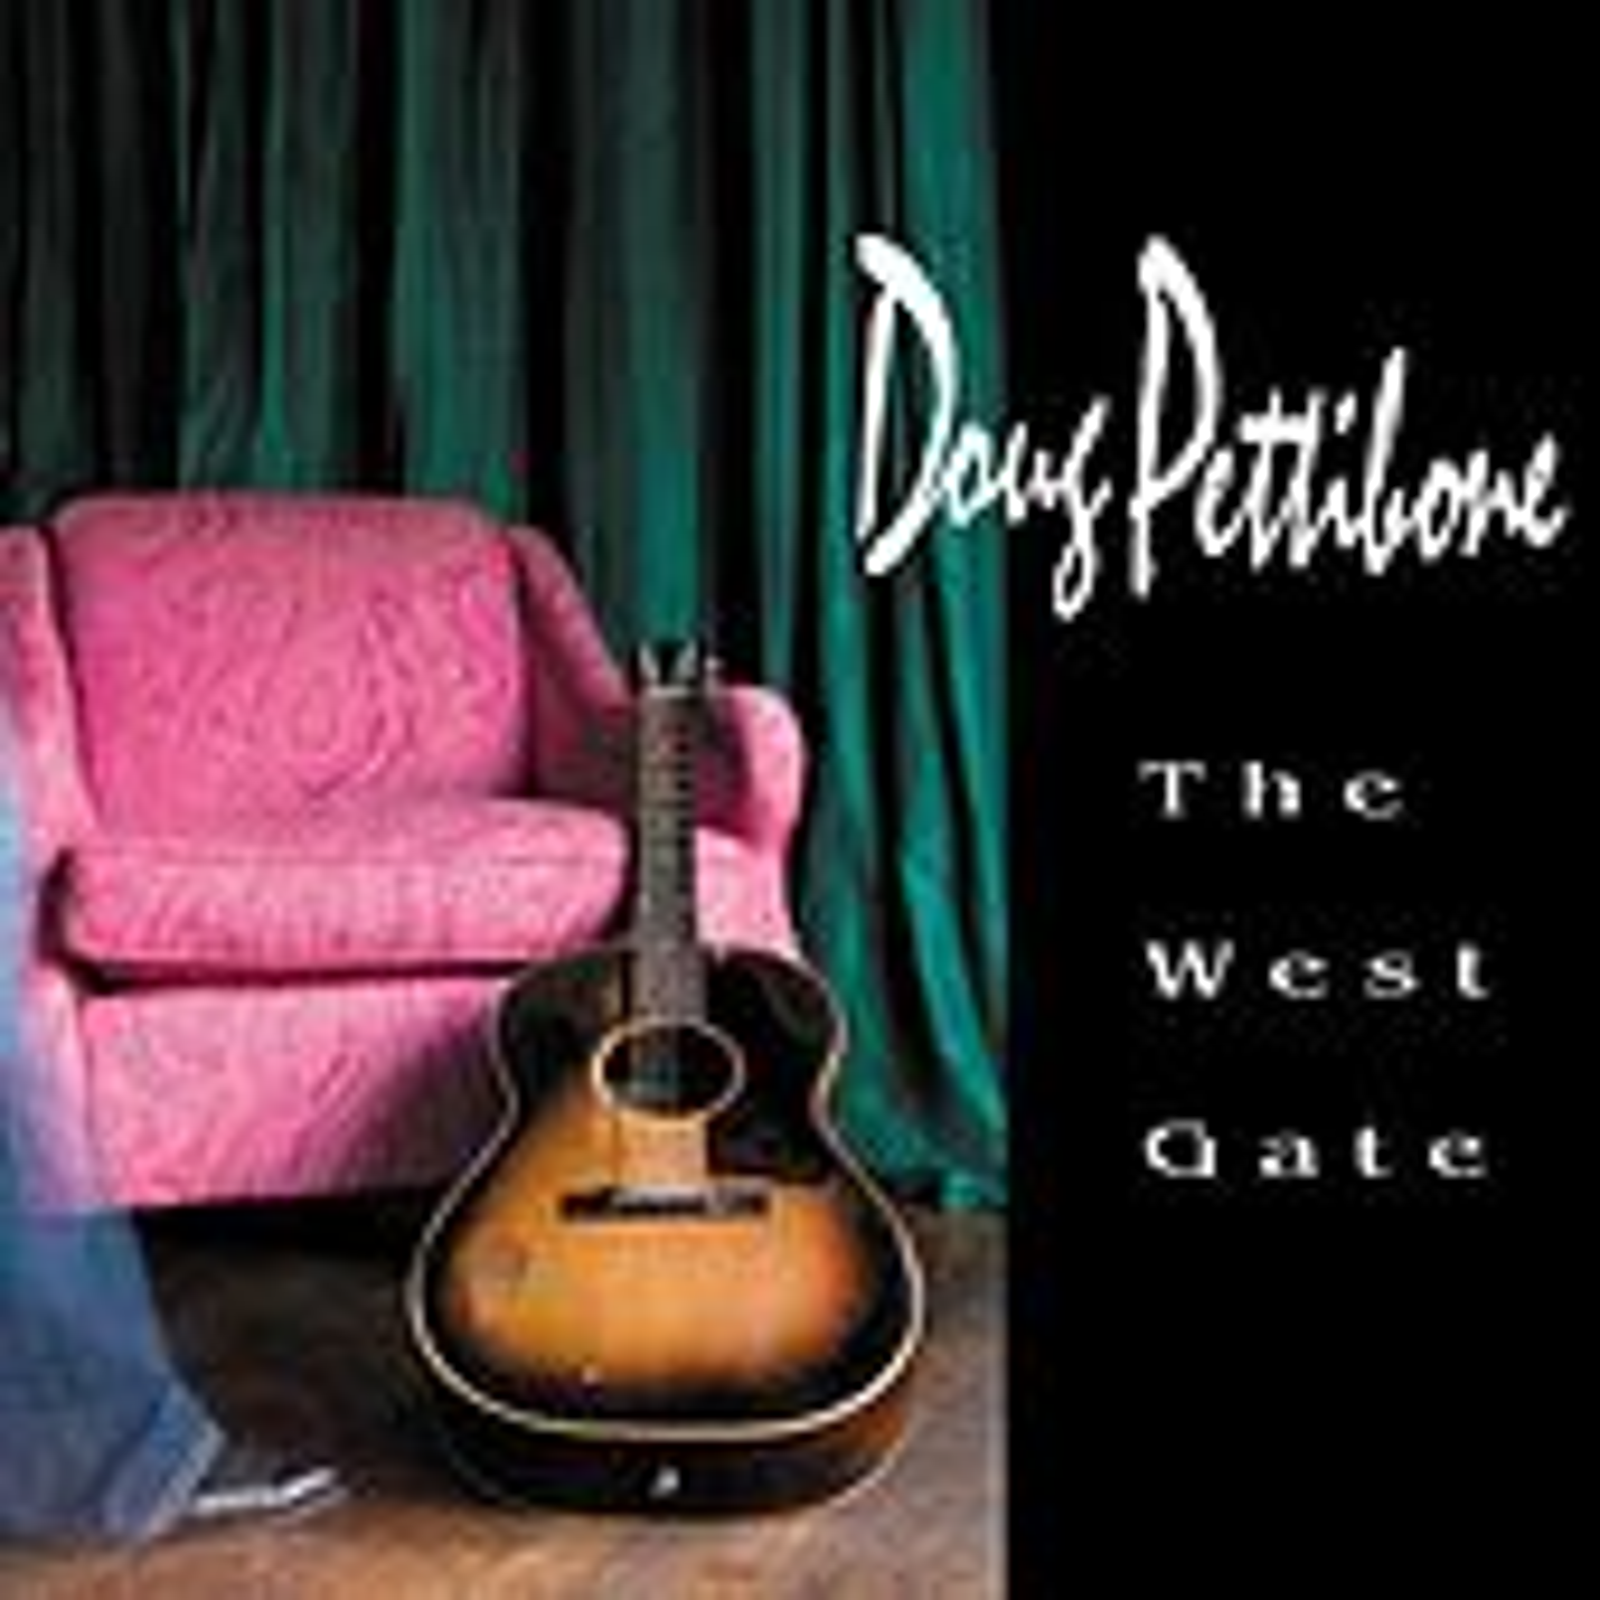 The West Gate by Doug Pettibone